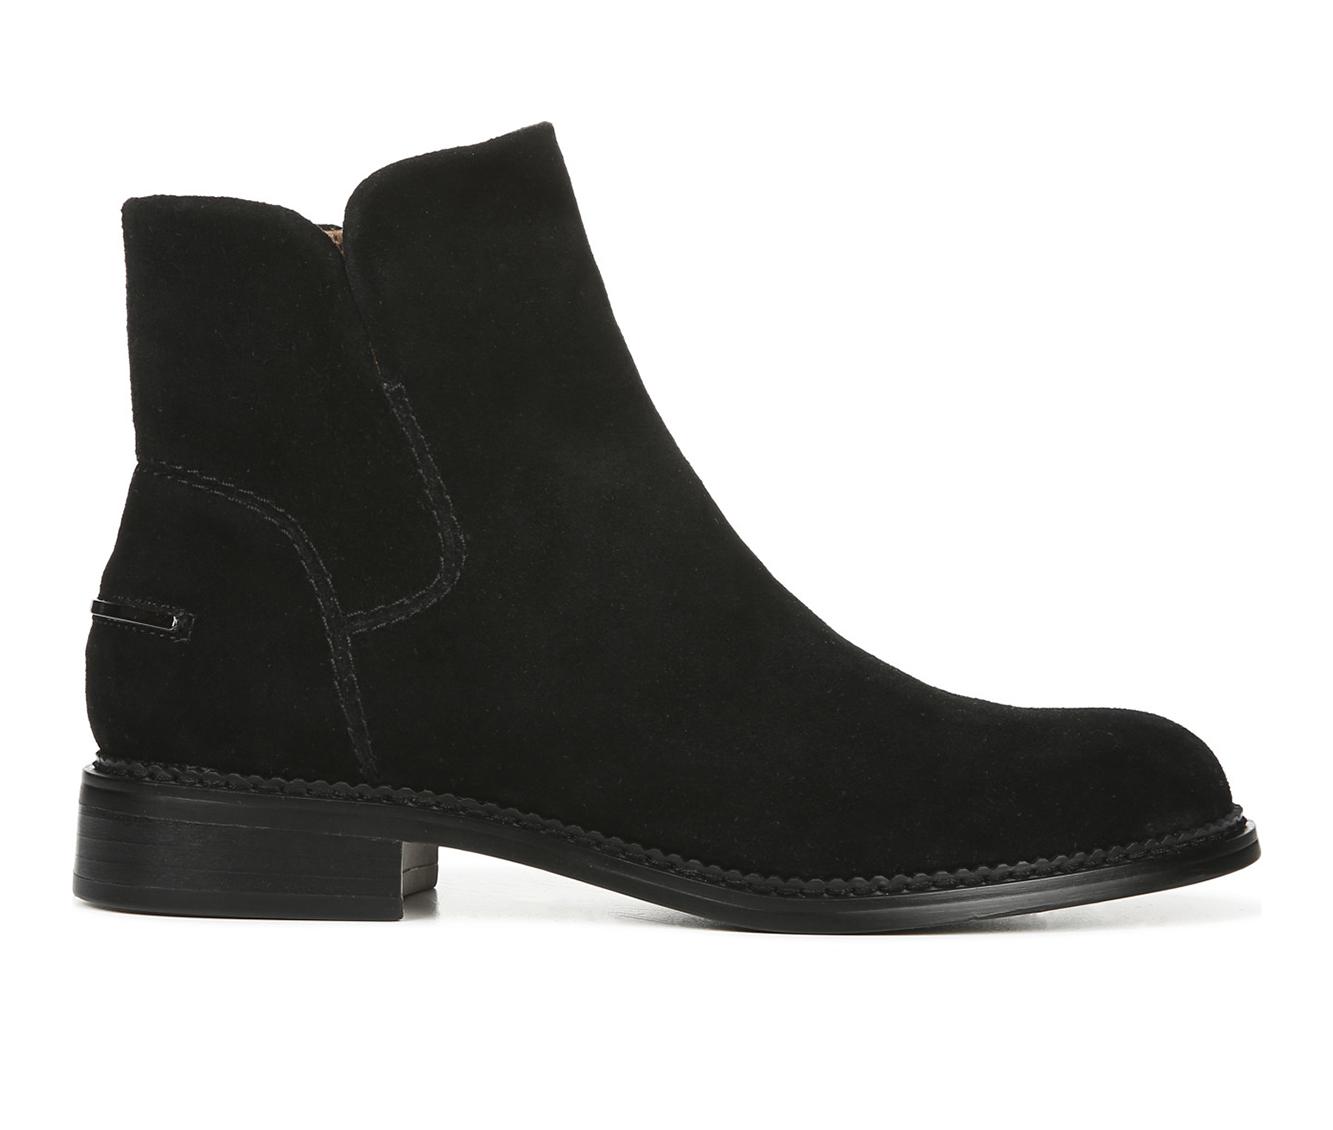 Franco Sarto Happily Women's Boot (Black Suede)